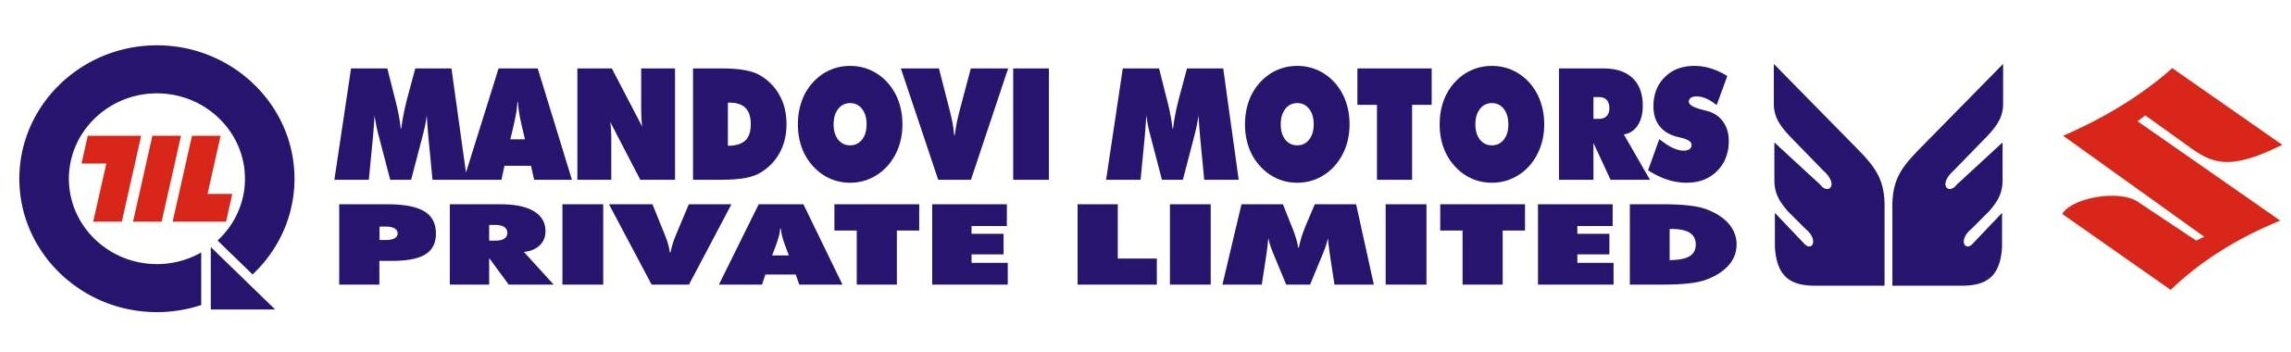 Mandovi Motors